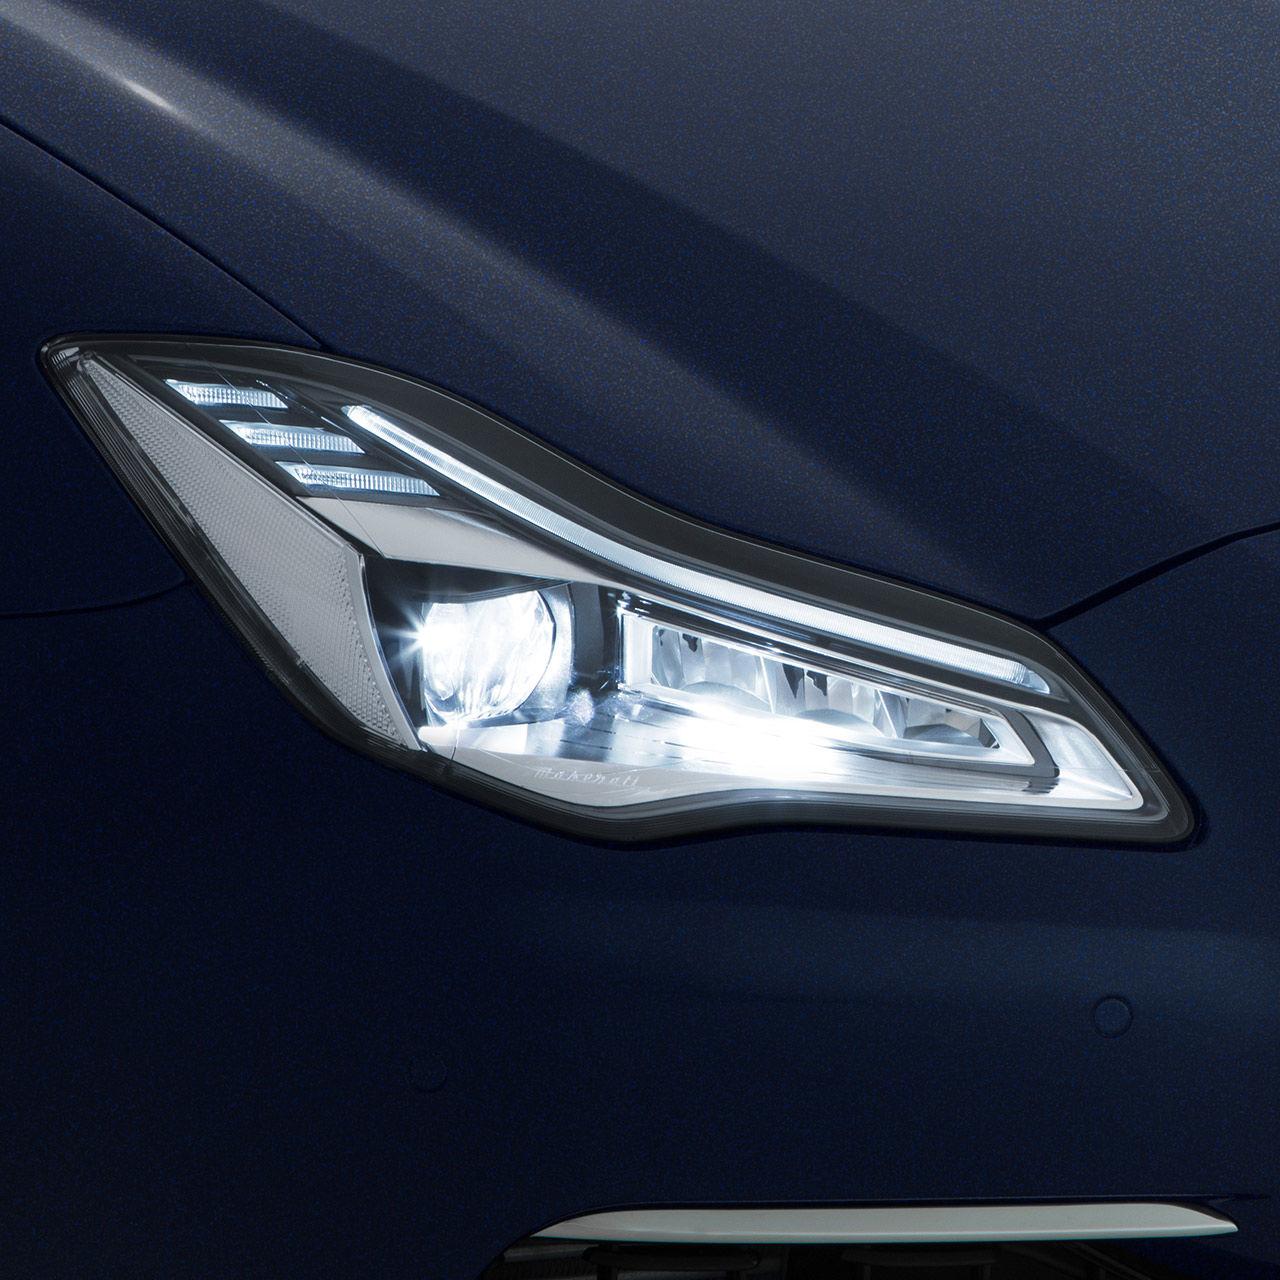 Maserati Quattroporte - Adaptive Voll-LED Matrix-Scheinwerfer